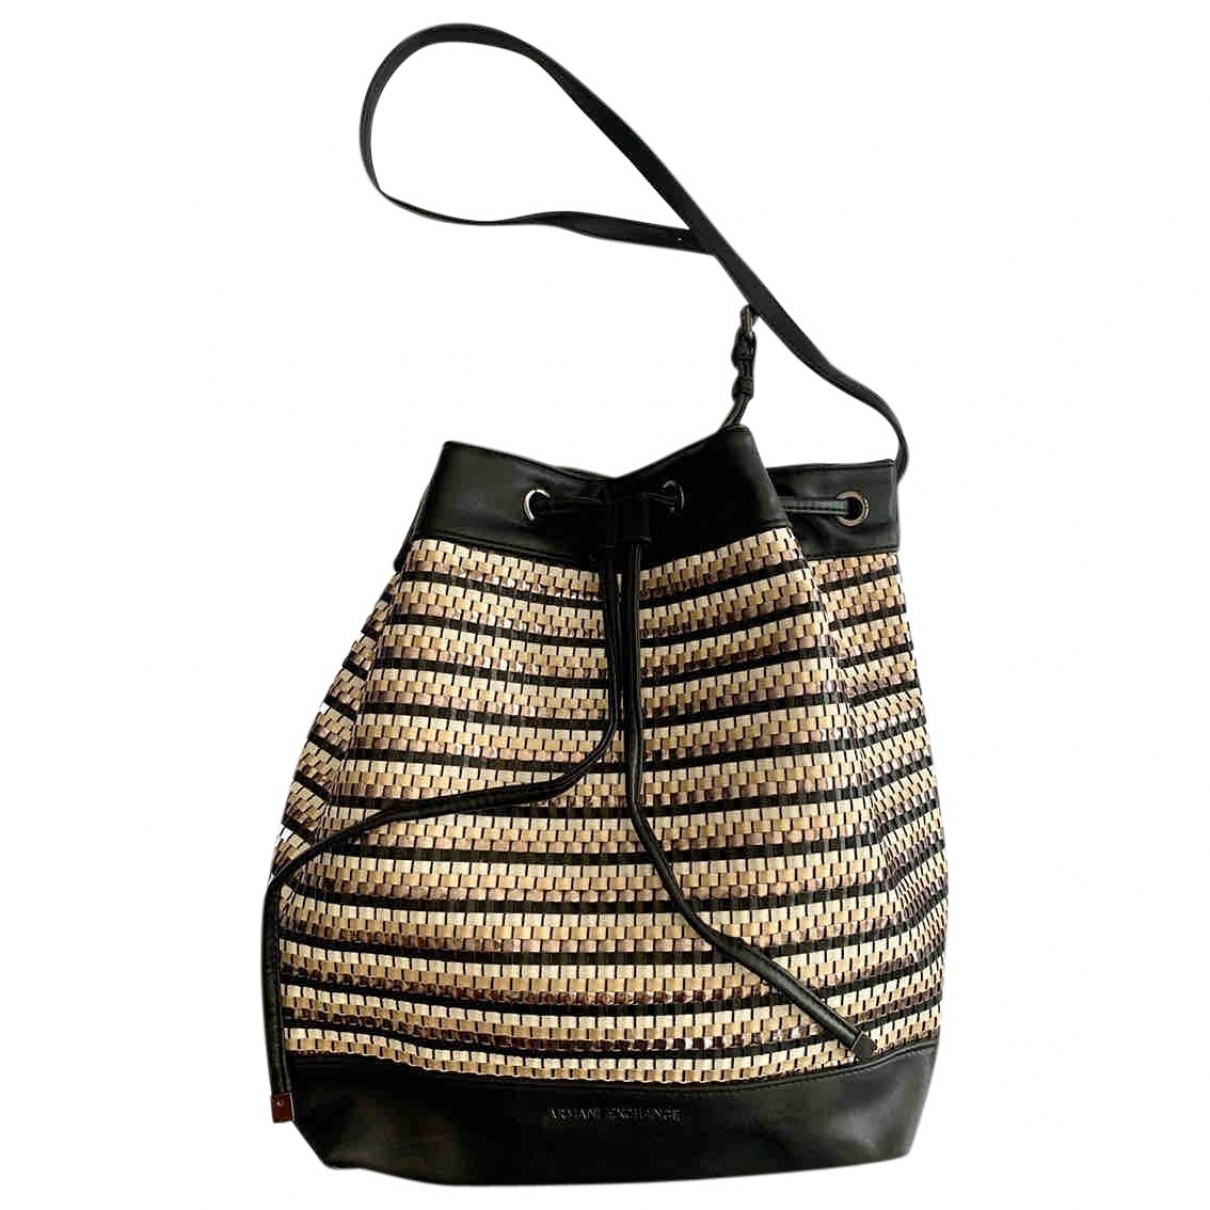 Emporio Armani \N Black Leather handbag for Women \N